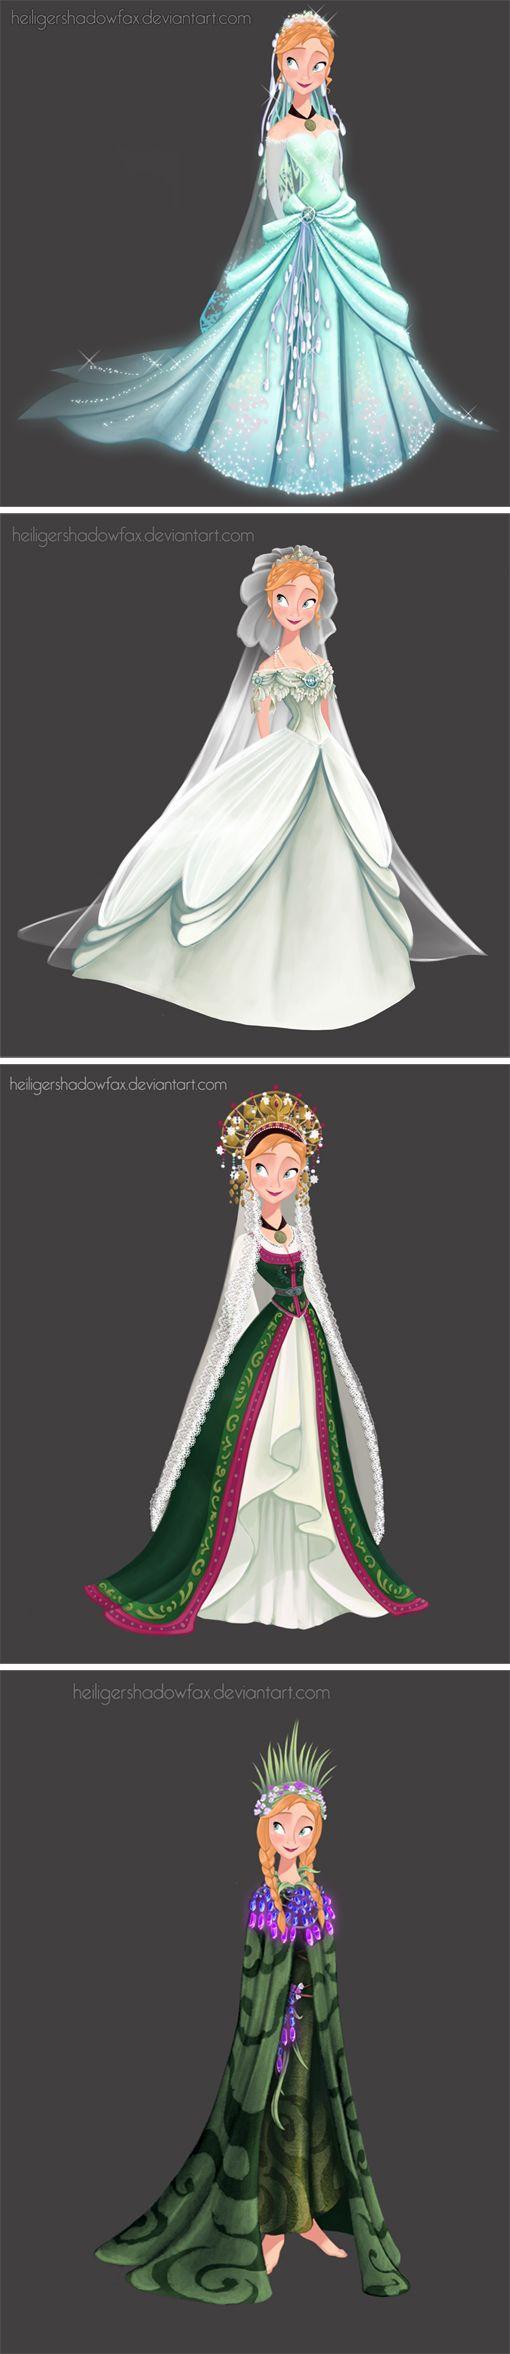 Anna's wedding dresses